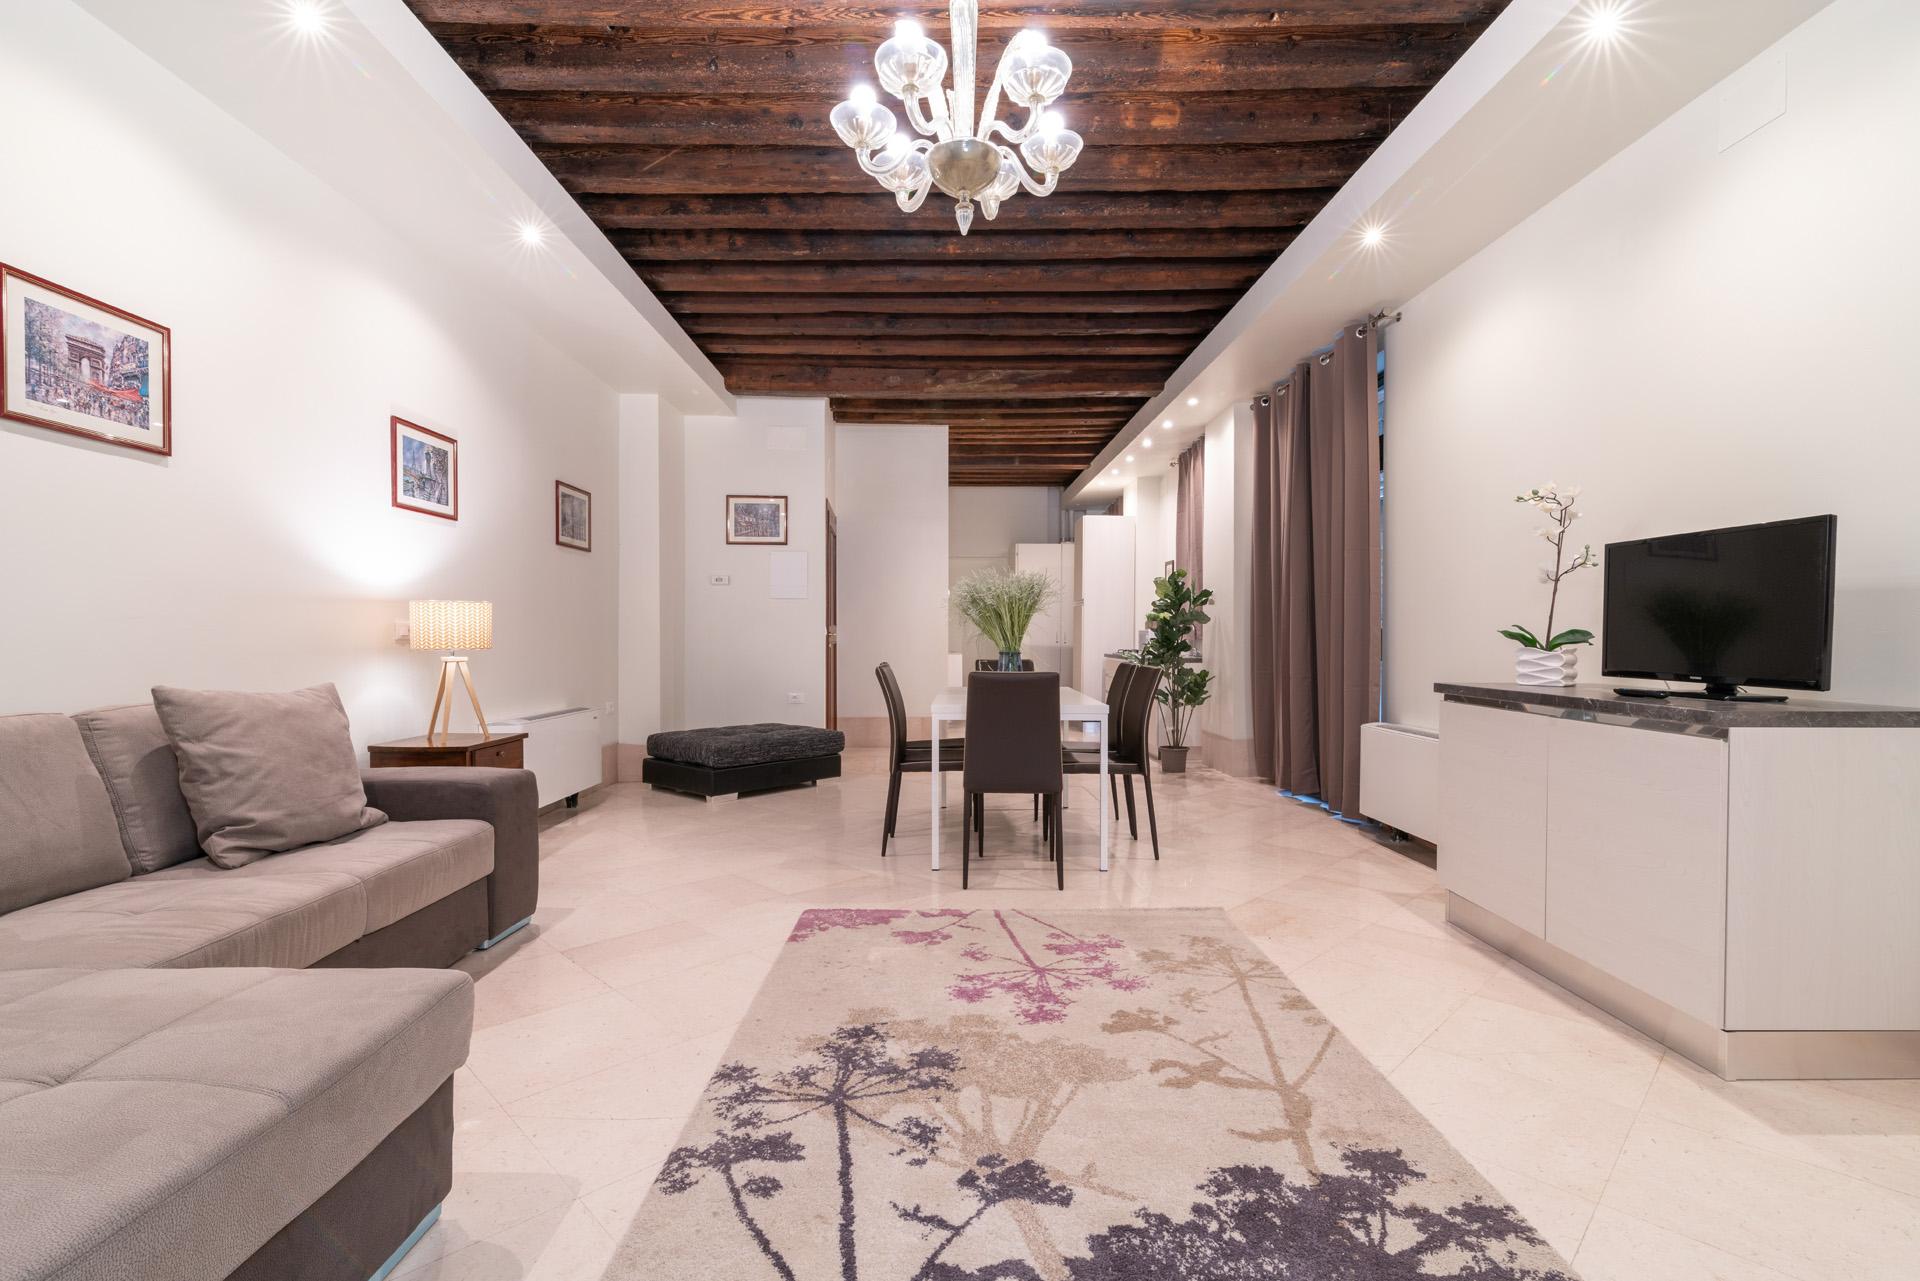 Fotografo di interni per hotel bnb appartamenti agenzie for Design interni appartamenti